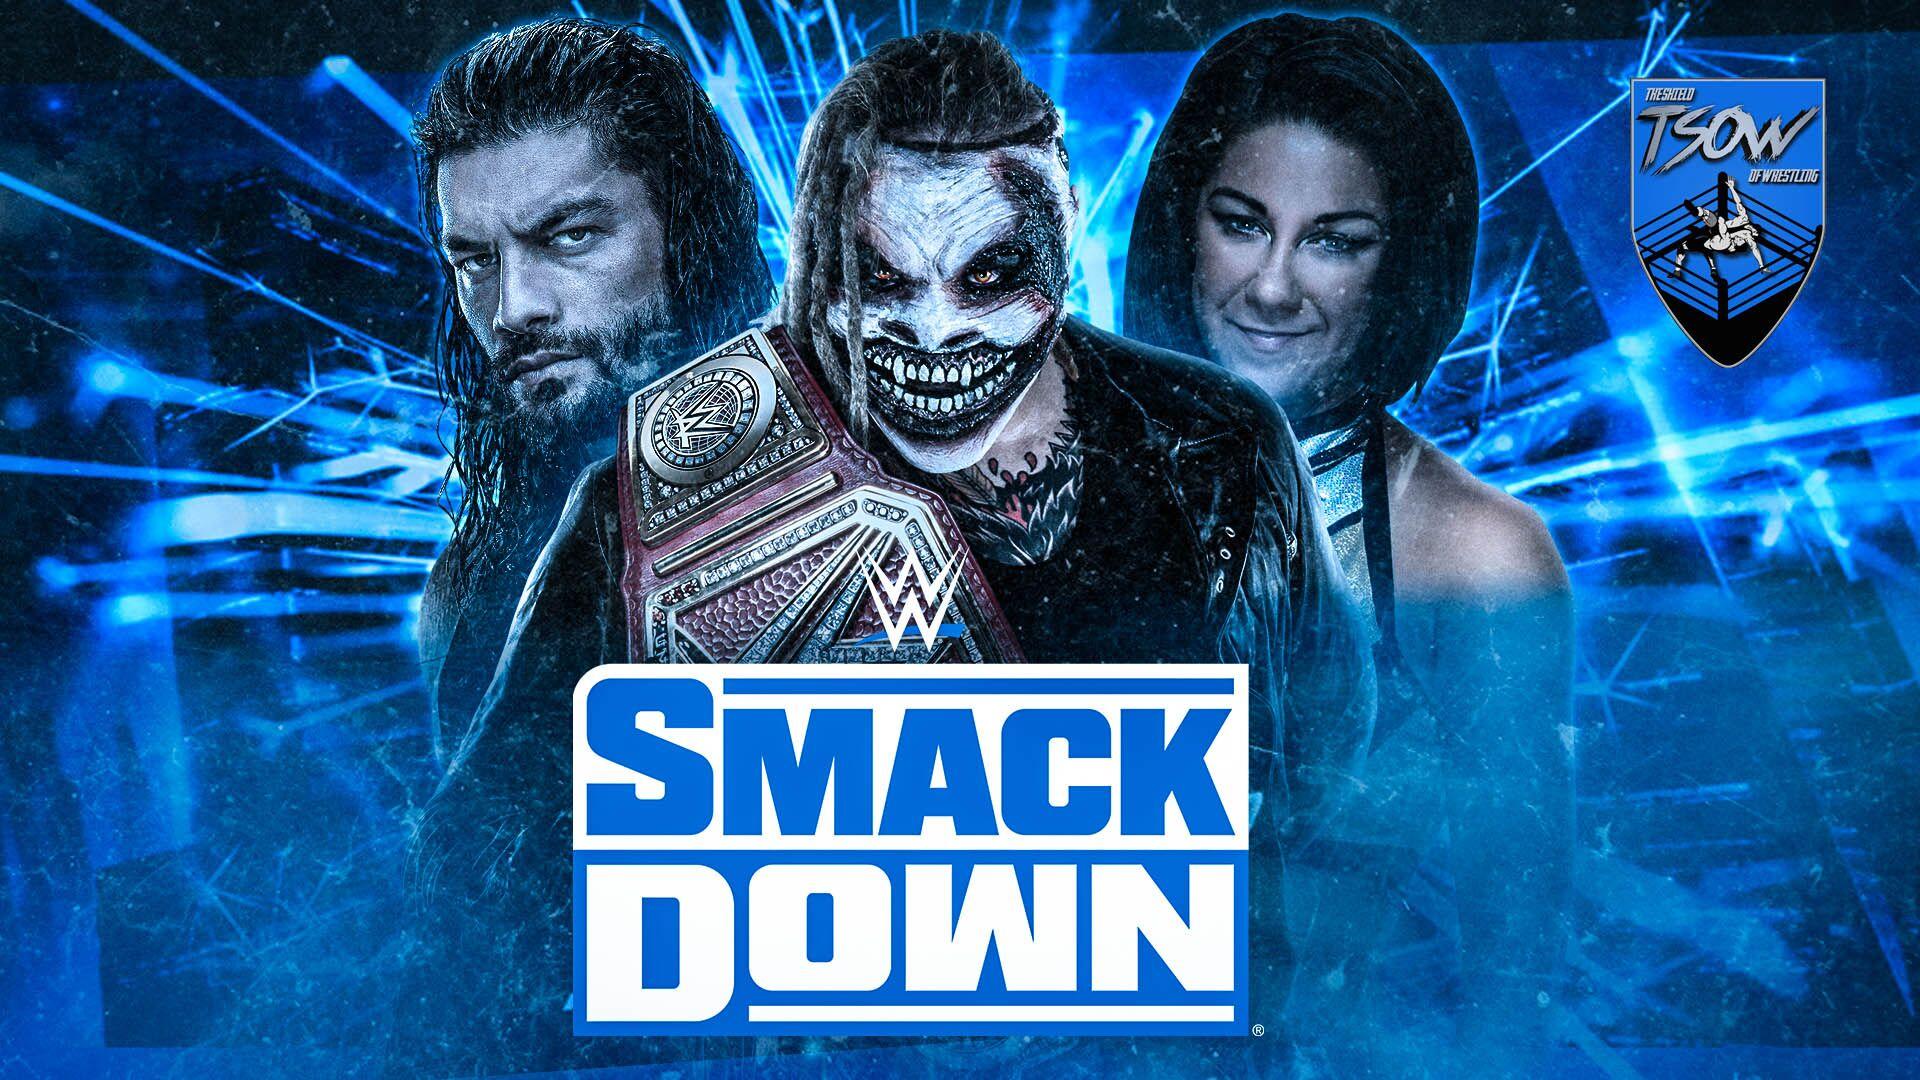 SmackDown 08-11-2019 Report